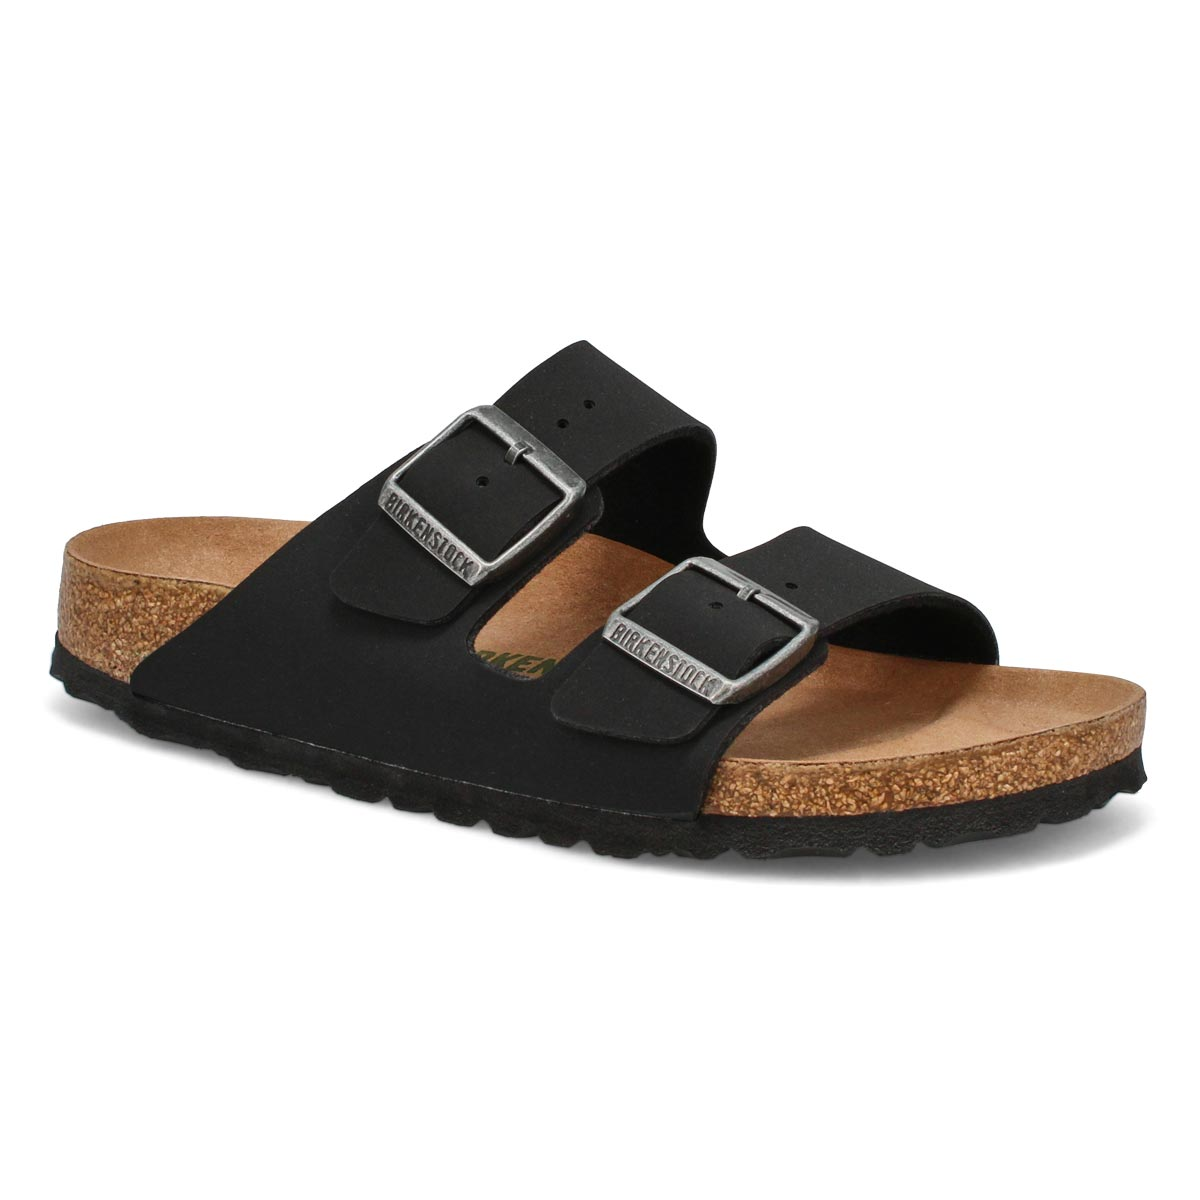 Women's Arizona Vegan Narrow Sandal - Black